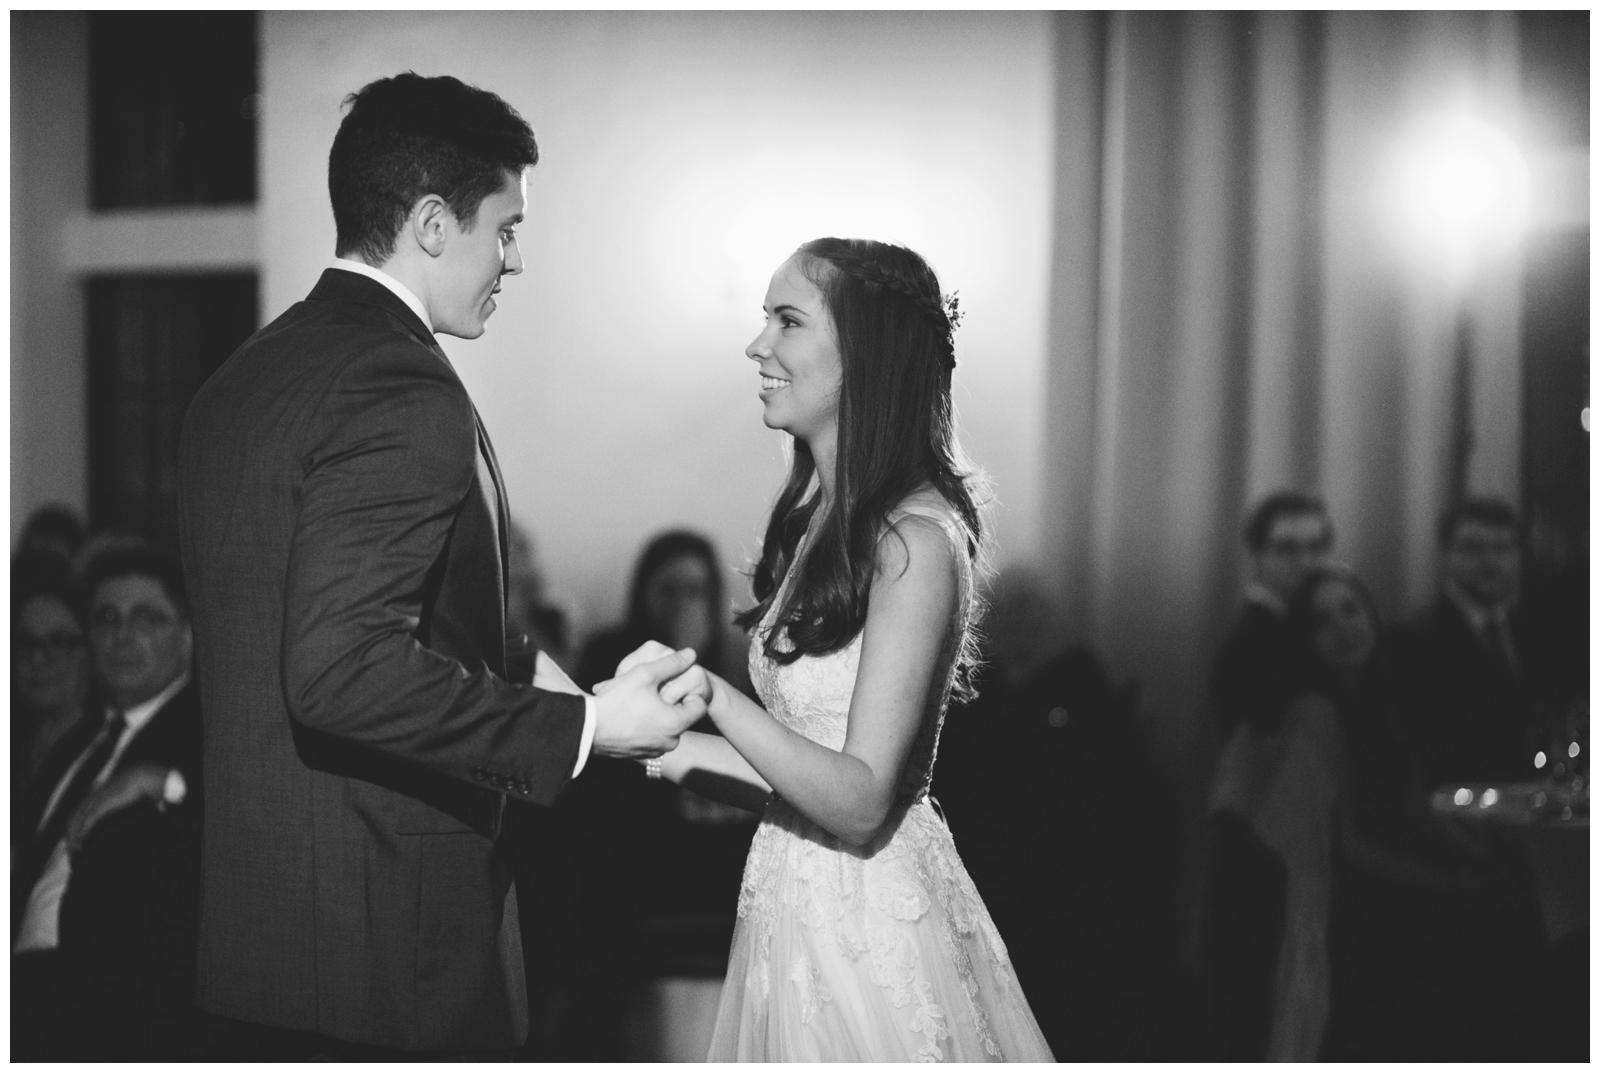 Alden-Castle-Wedding-Boston-Bailey-Q-Photo-047.jpg